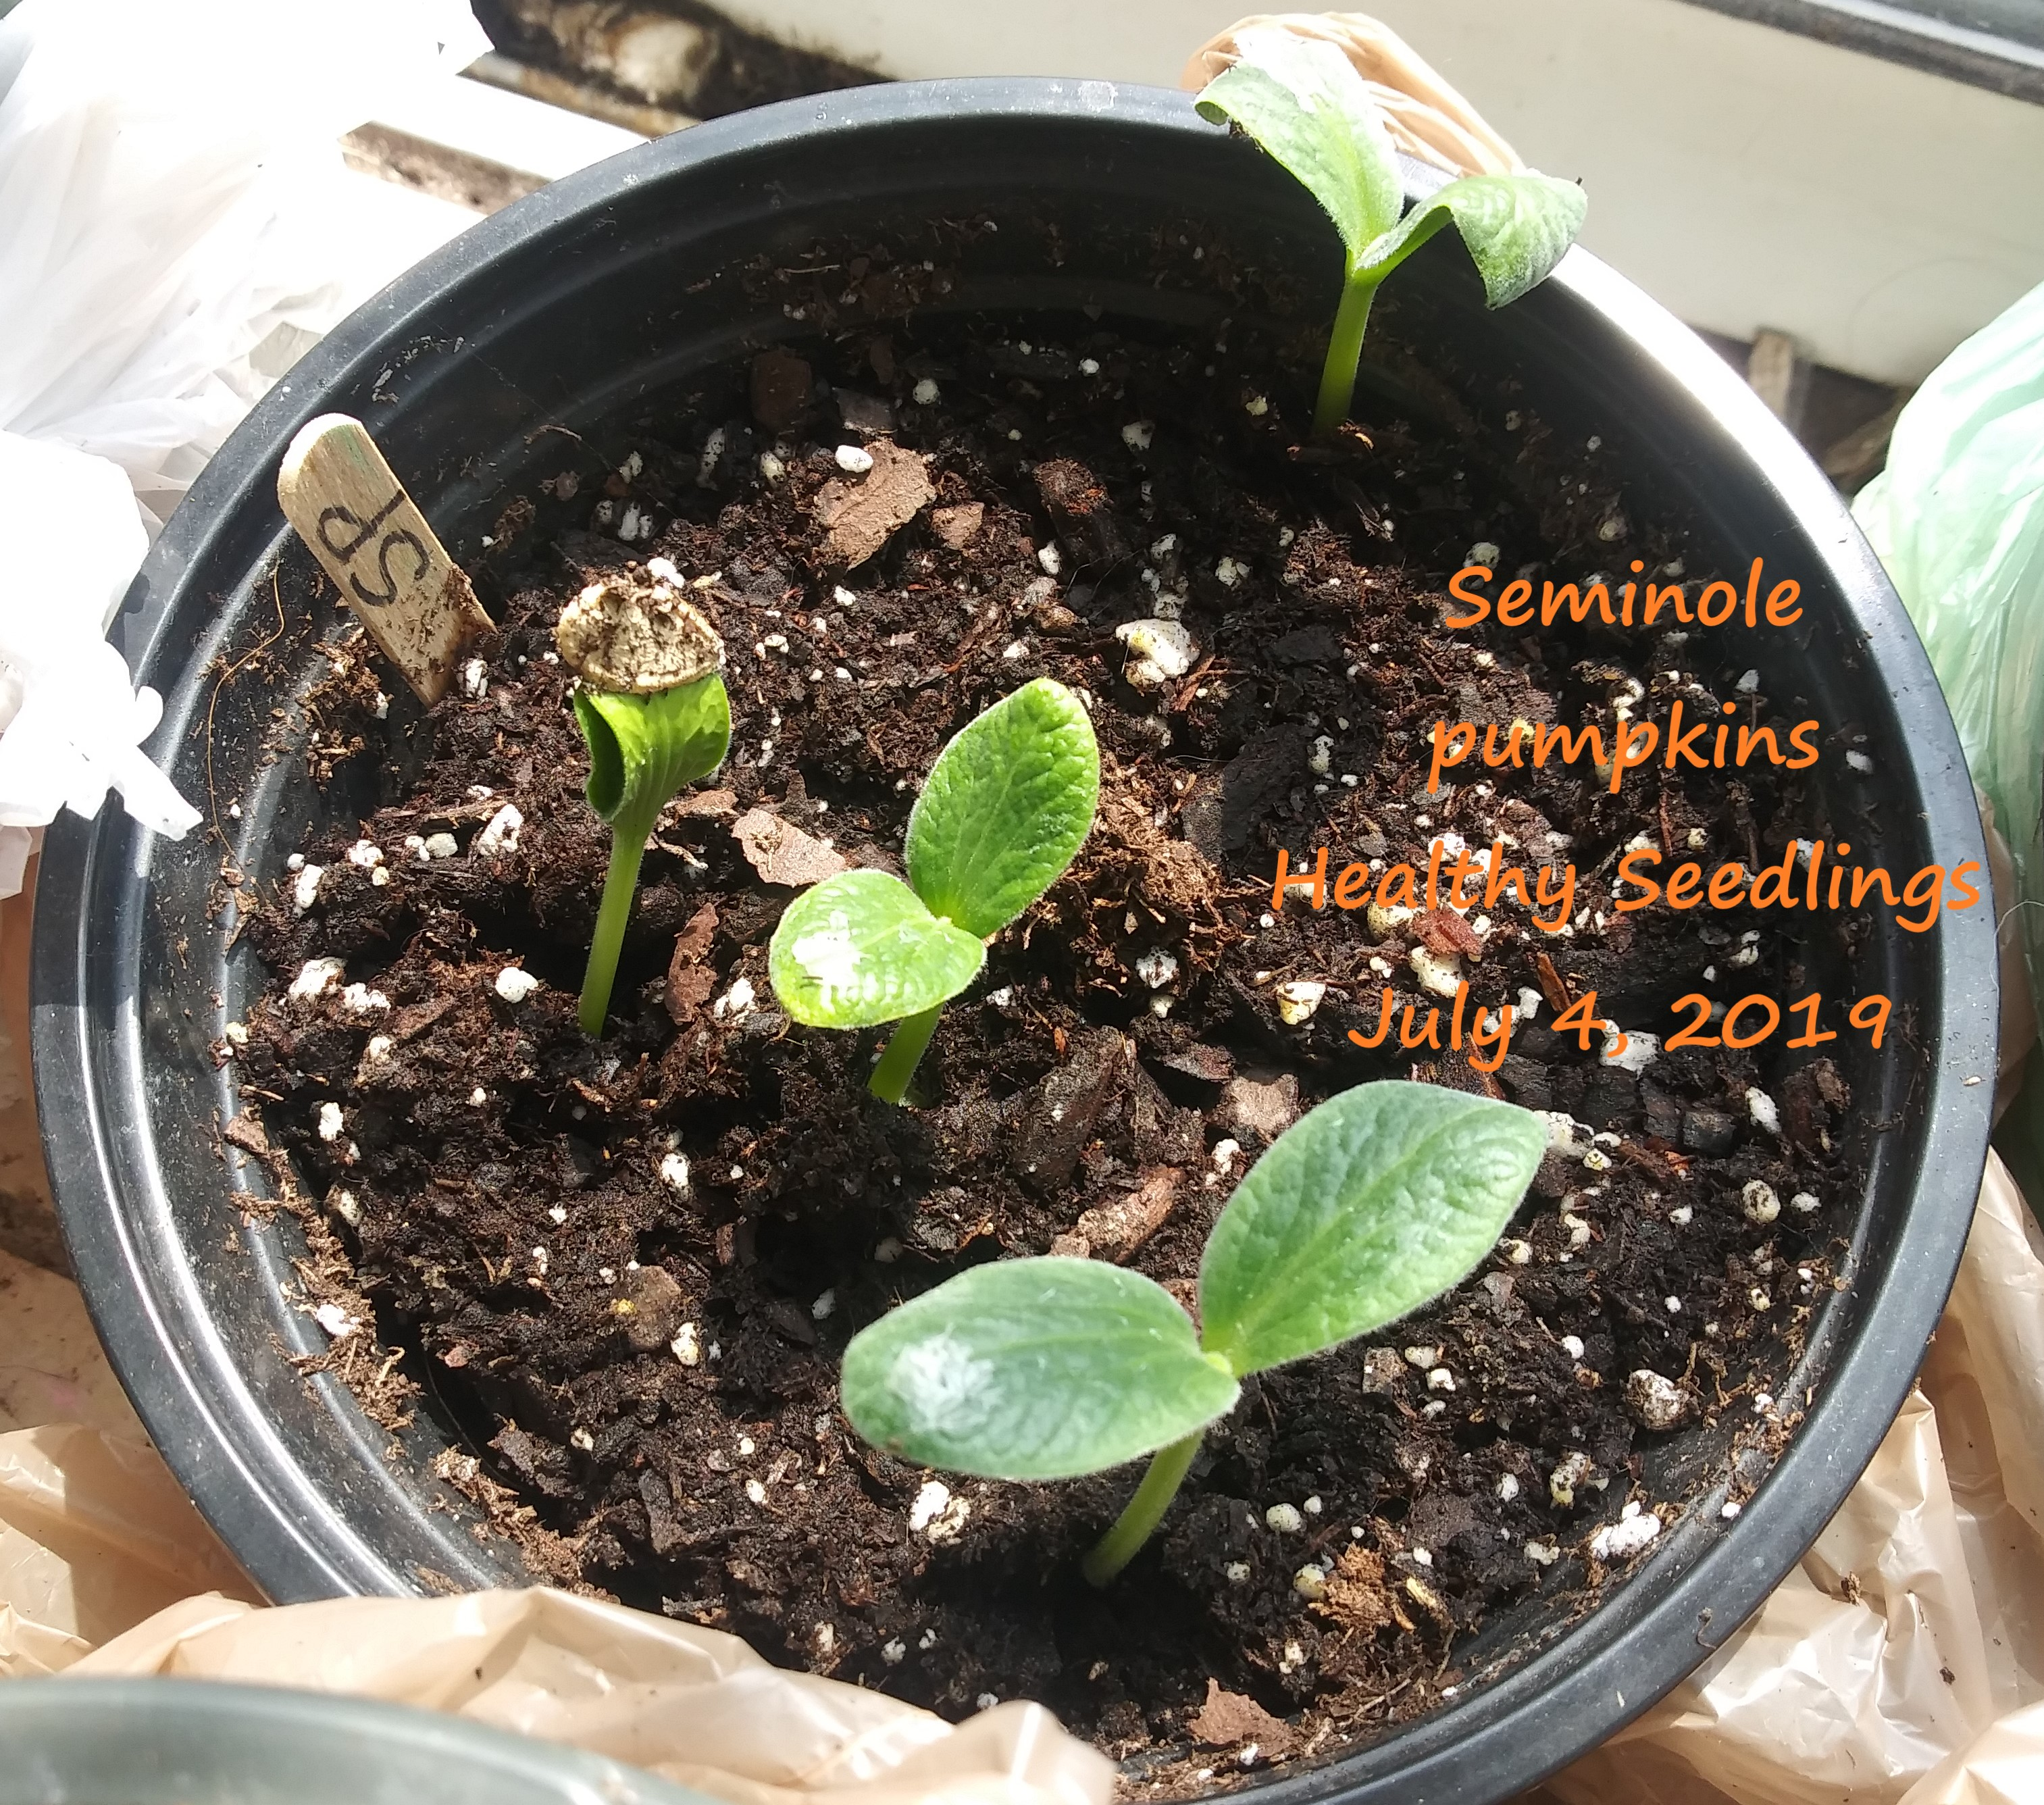 Seminole pumpkin July 4